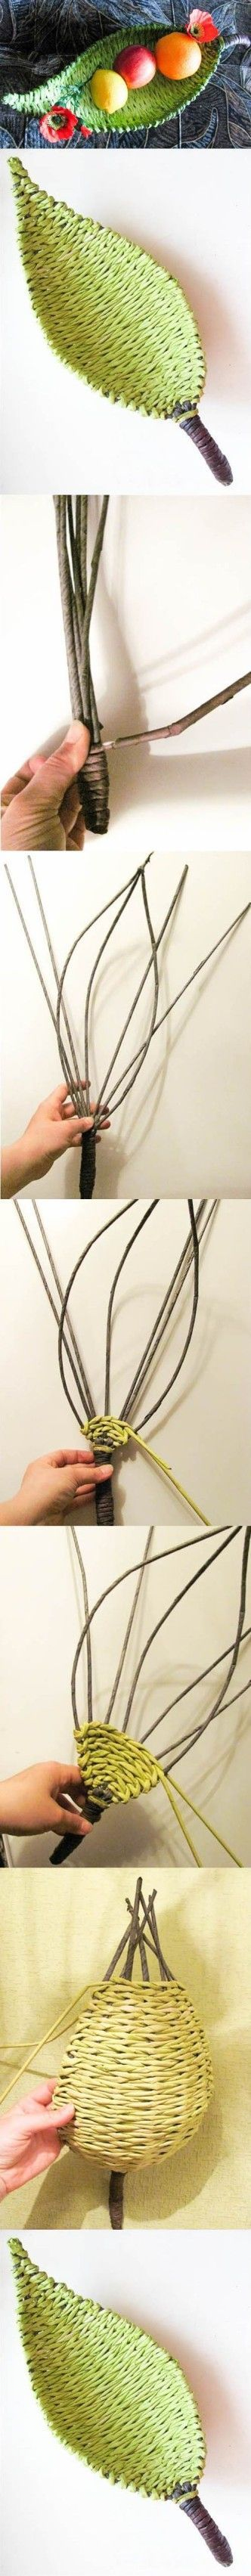 DIY Beautiful Paper Woven Tray 2